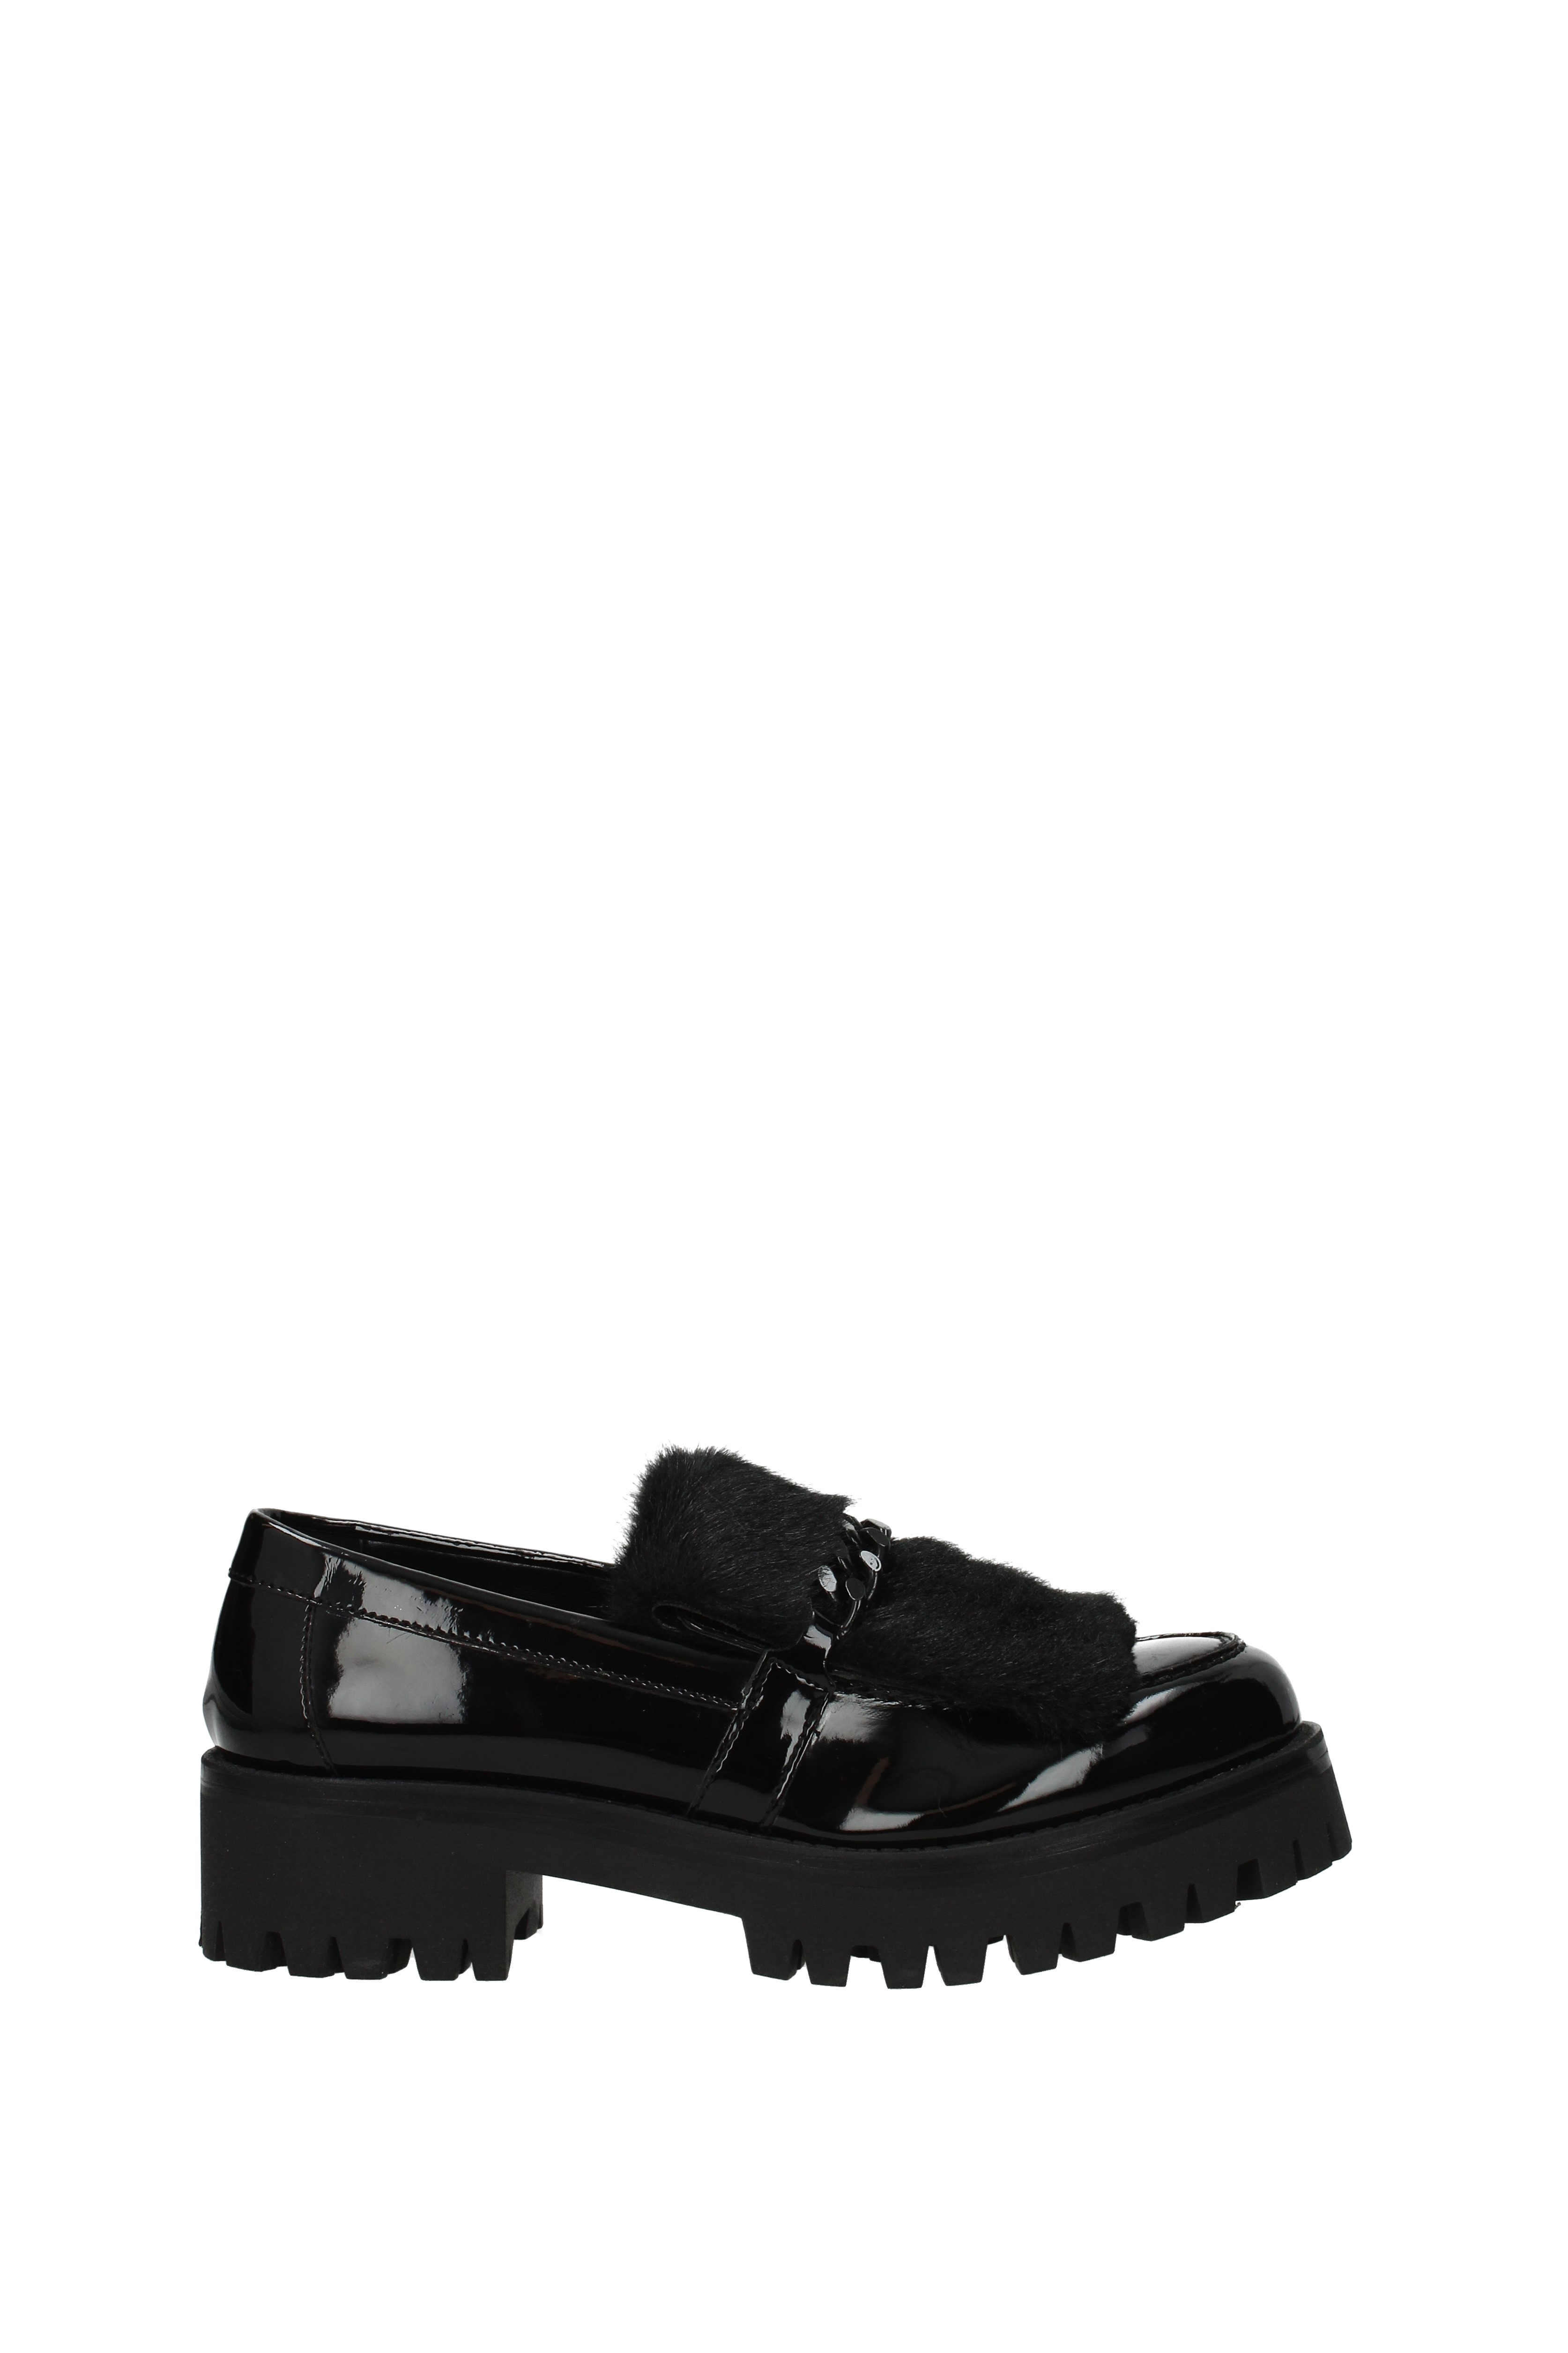 Loafers Damens Cult slayer Damens Loafers - Eco Leder (1232CLE10270) a8ff1e